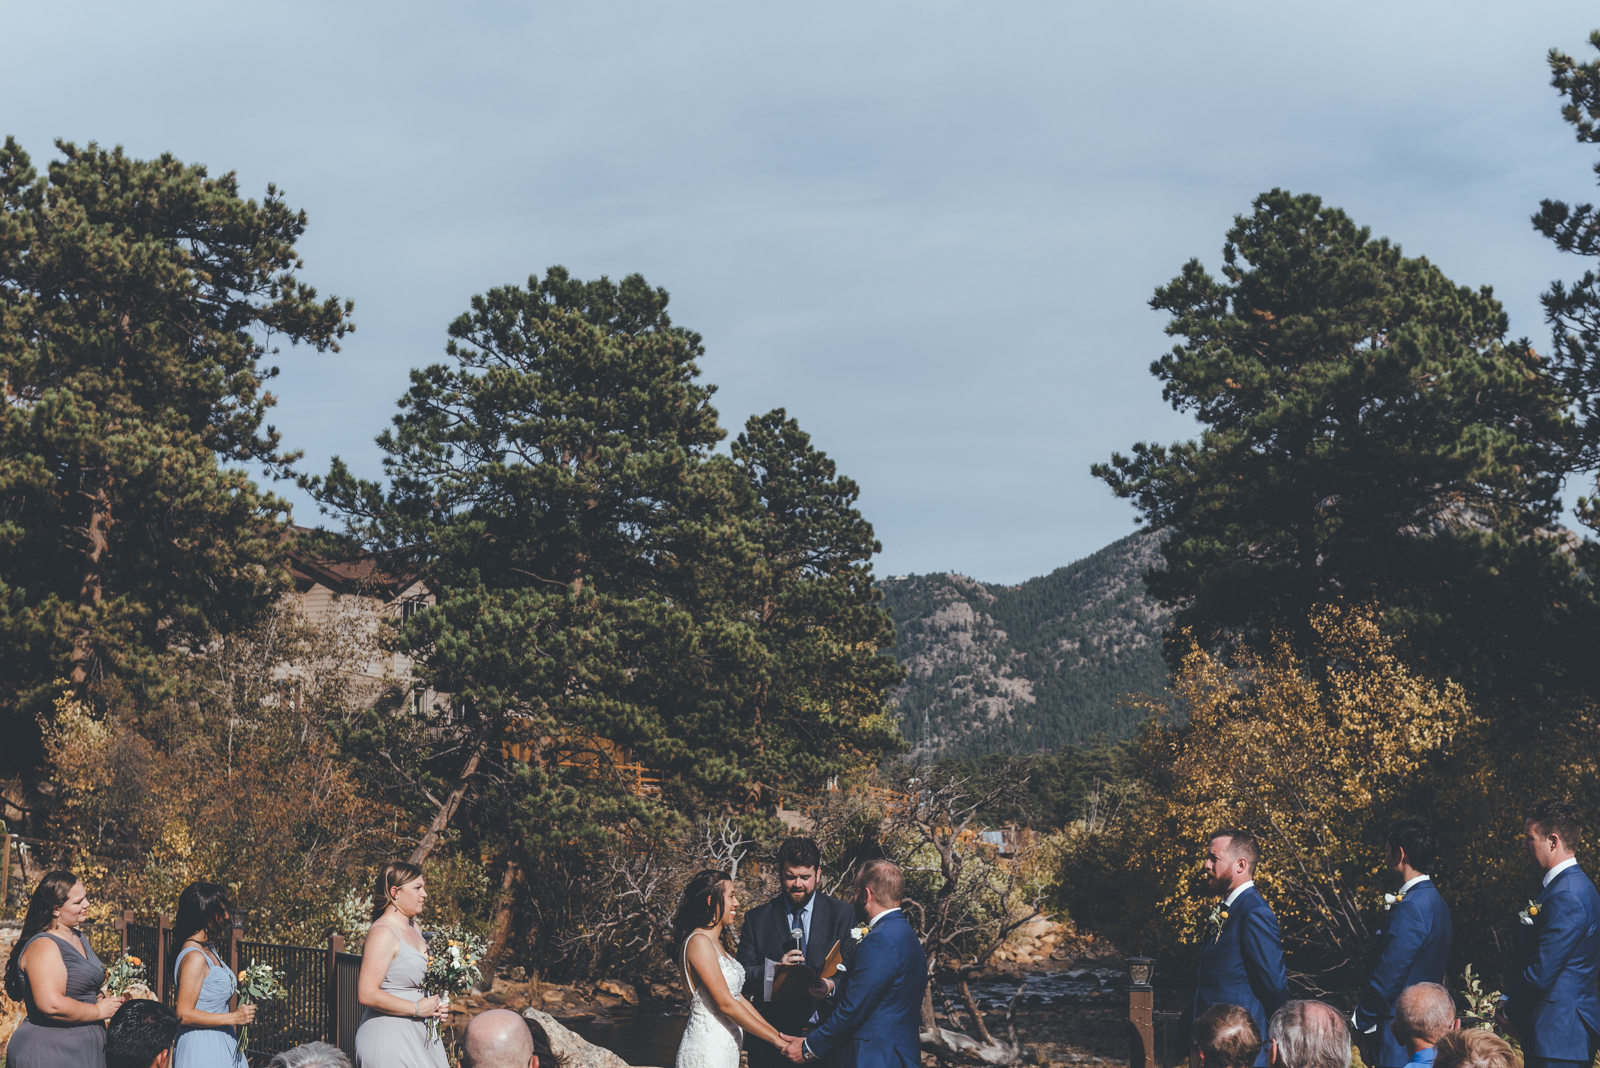 ChadFahnestockPhotography-estes-park-wedding-photography-022.jpg